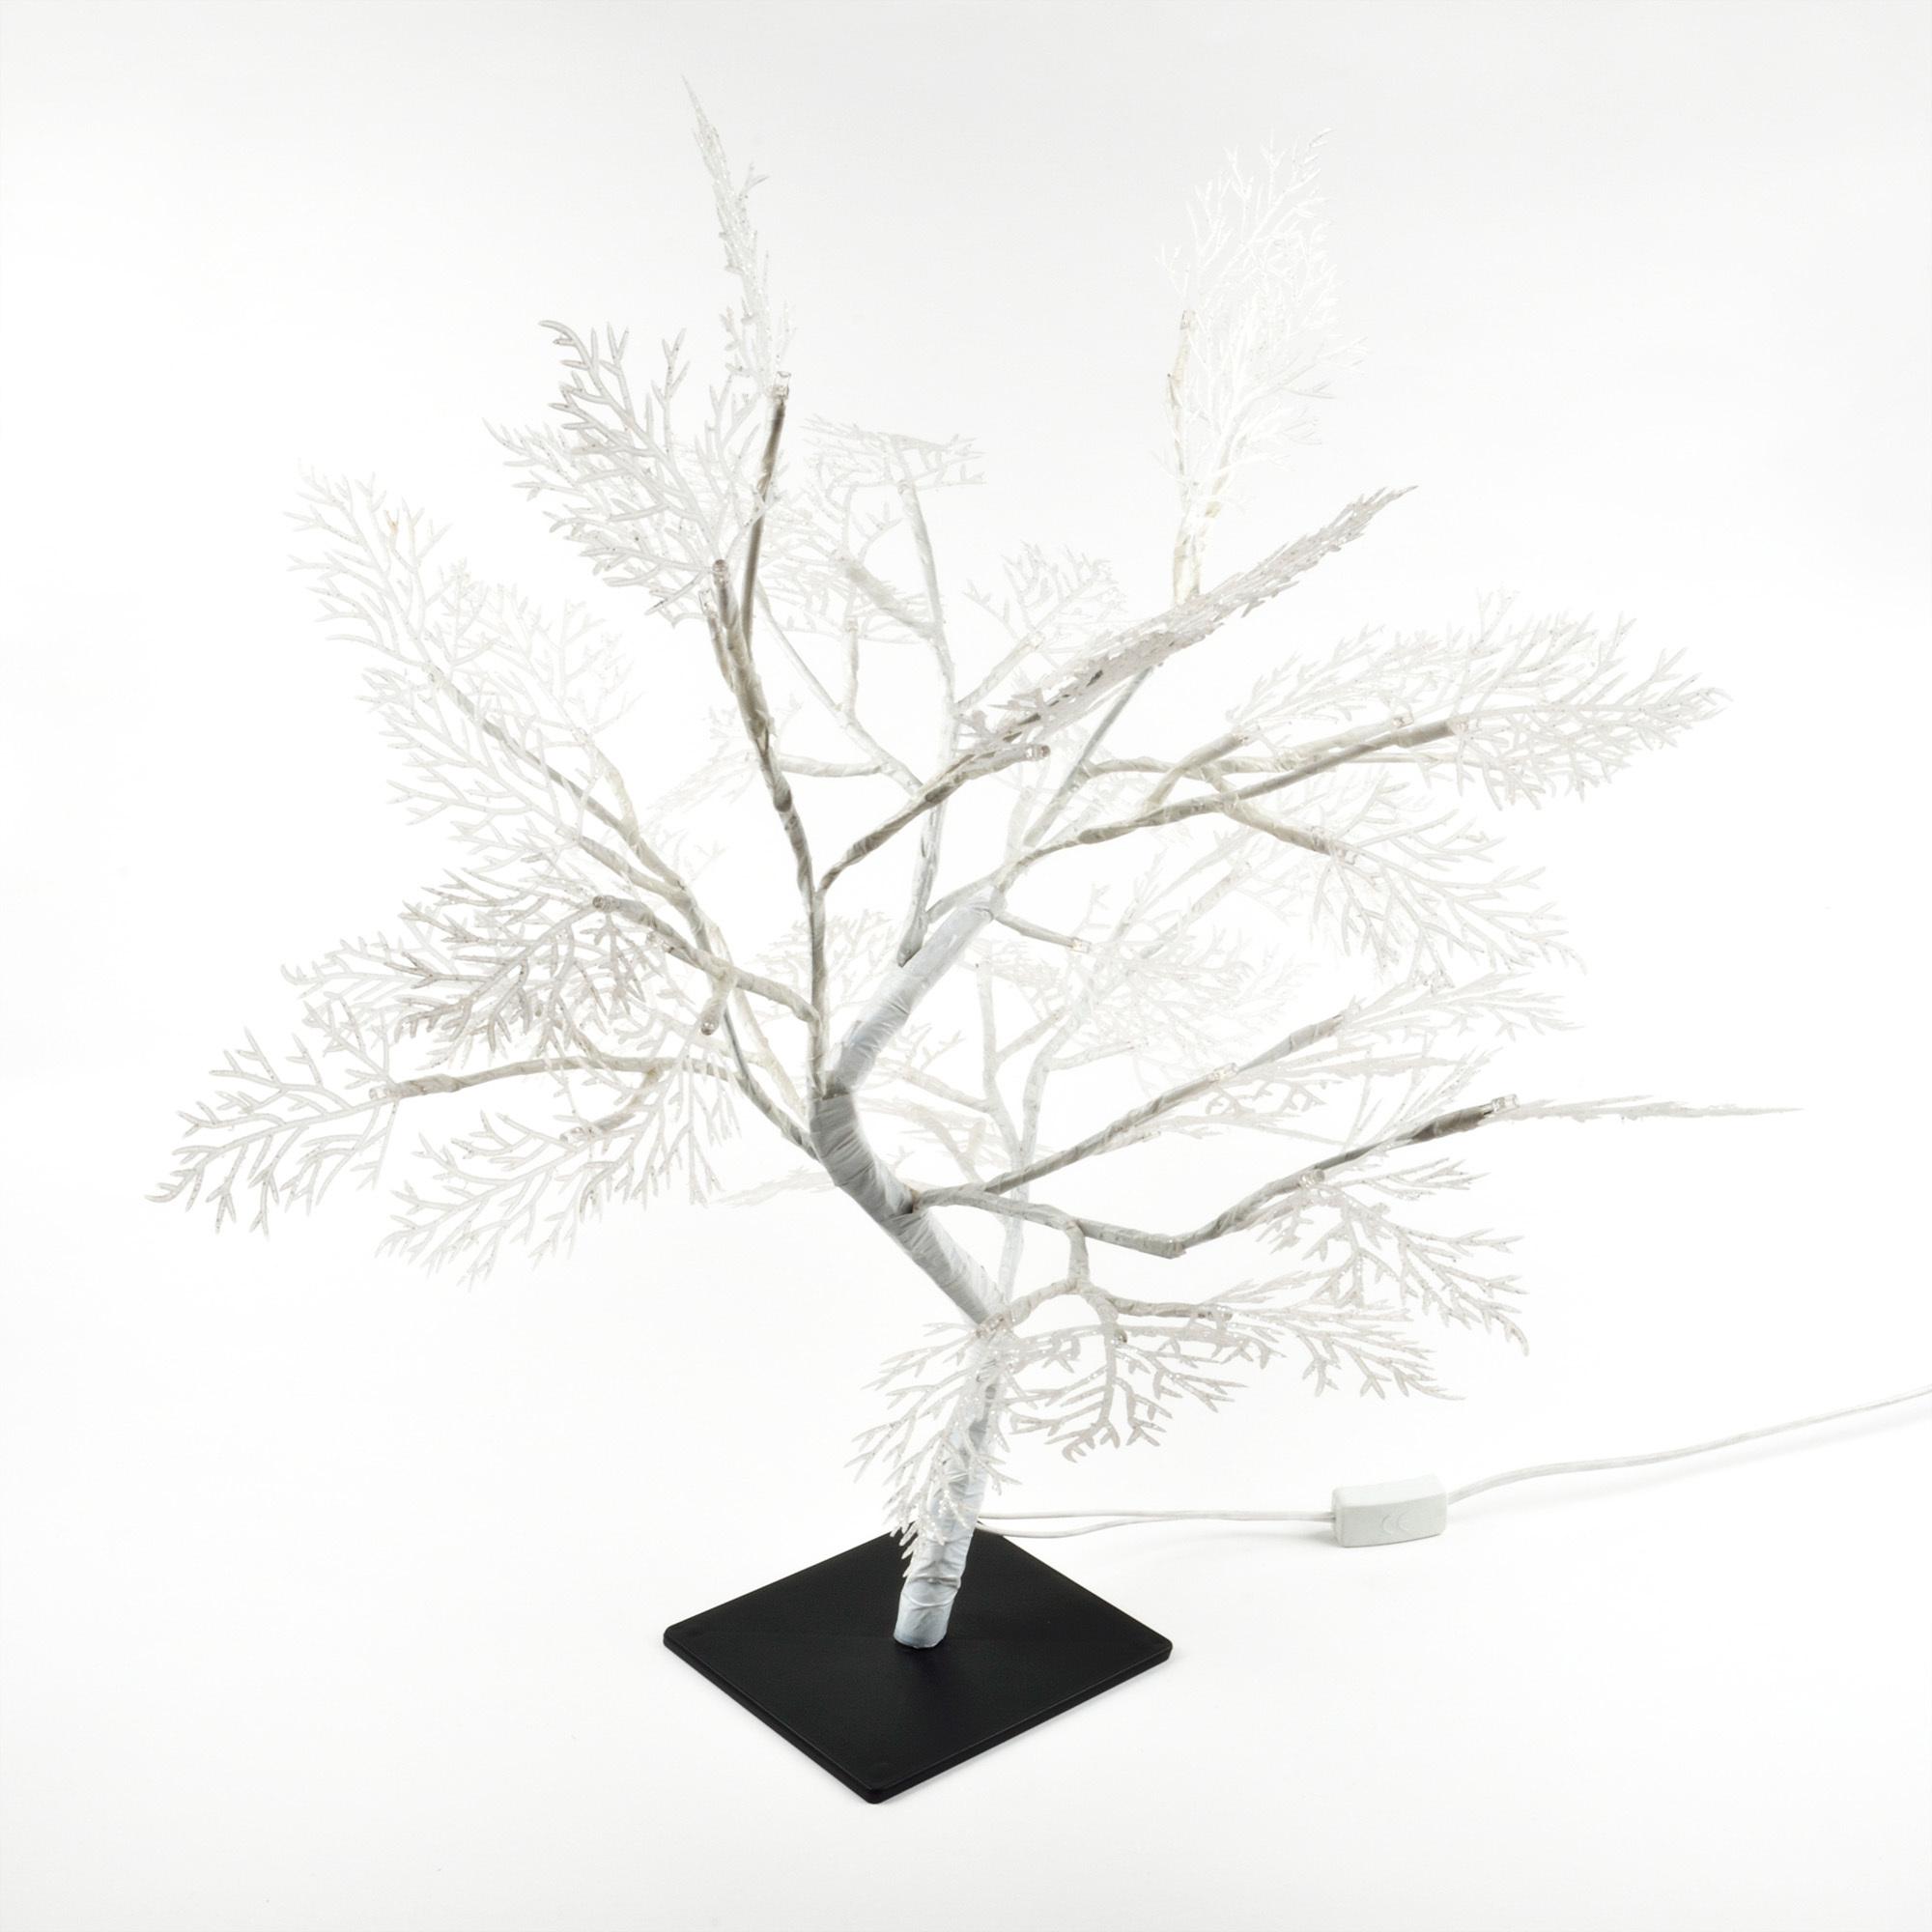 Дерево светодиодное Морозко ULD-T3550-054-SWA WHITE-BLUE IP20 FROST